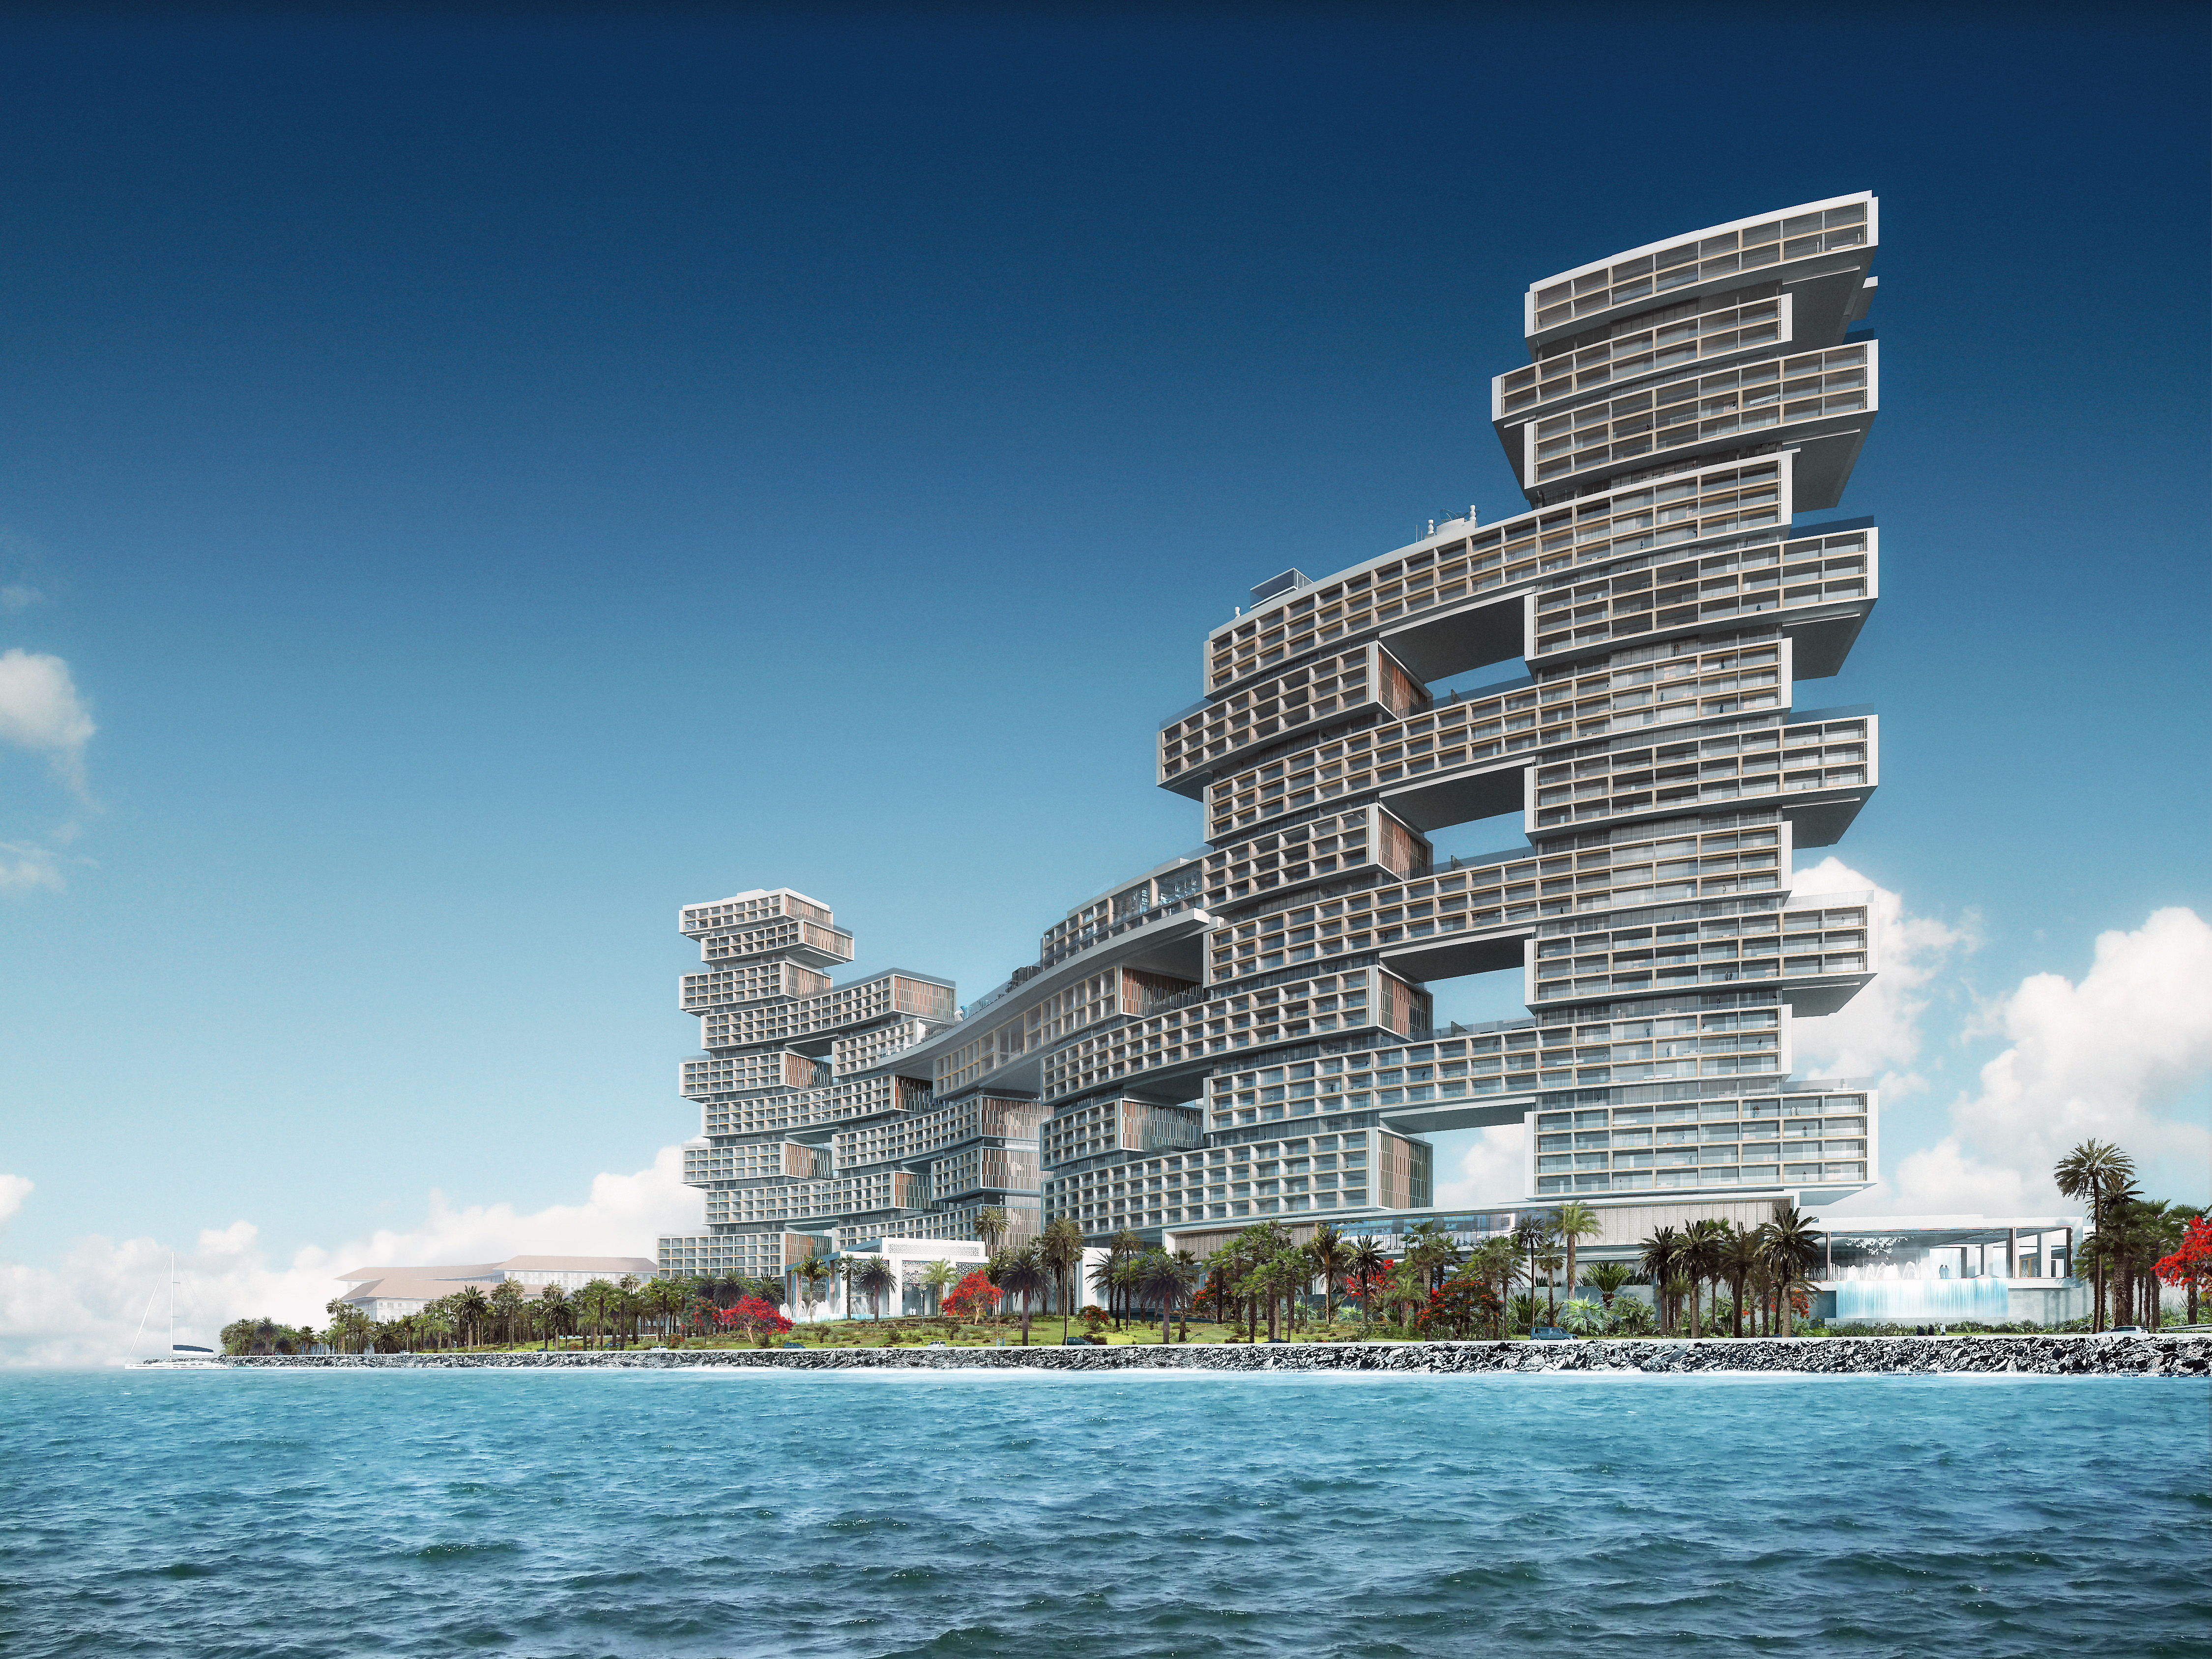 The Royal Atlantis Resort & Residences - BESIX